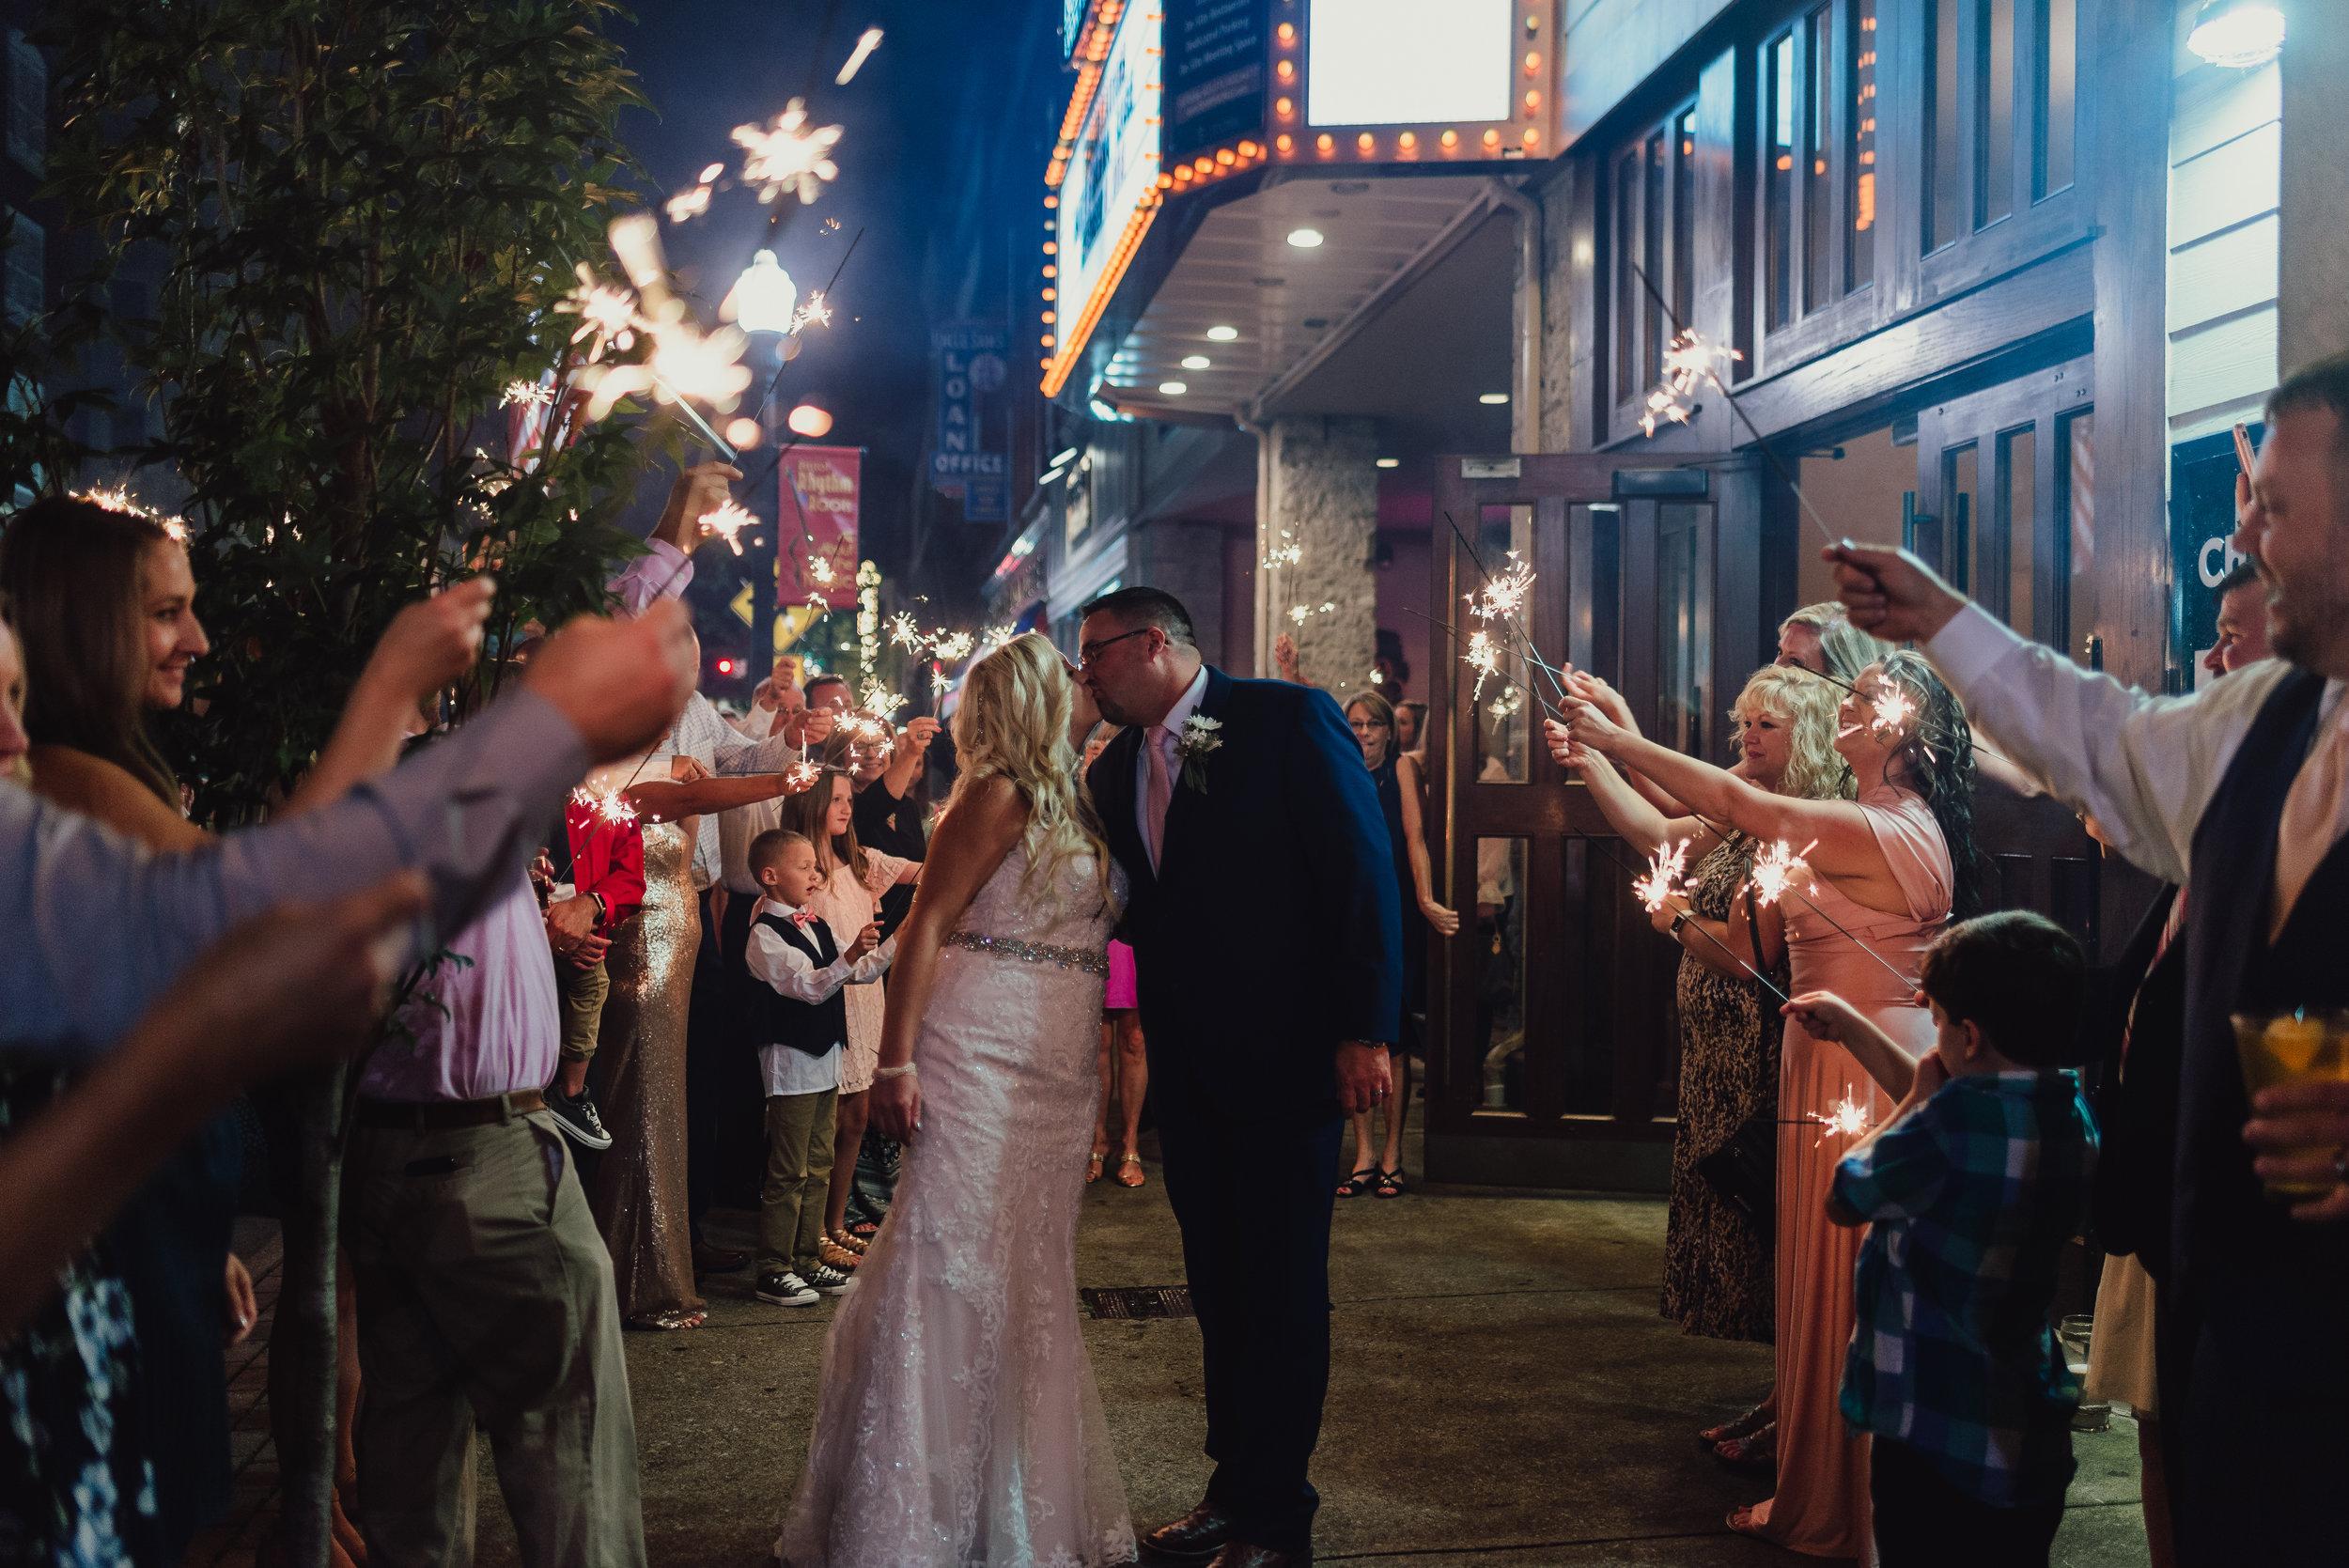 east-tn-wedding-photographer-tennessee-elopement-photographer-kingsport-tn-wedding-photographer (843 of 1001).jpg